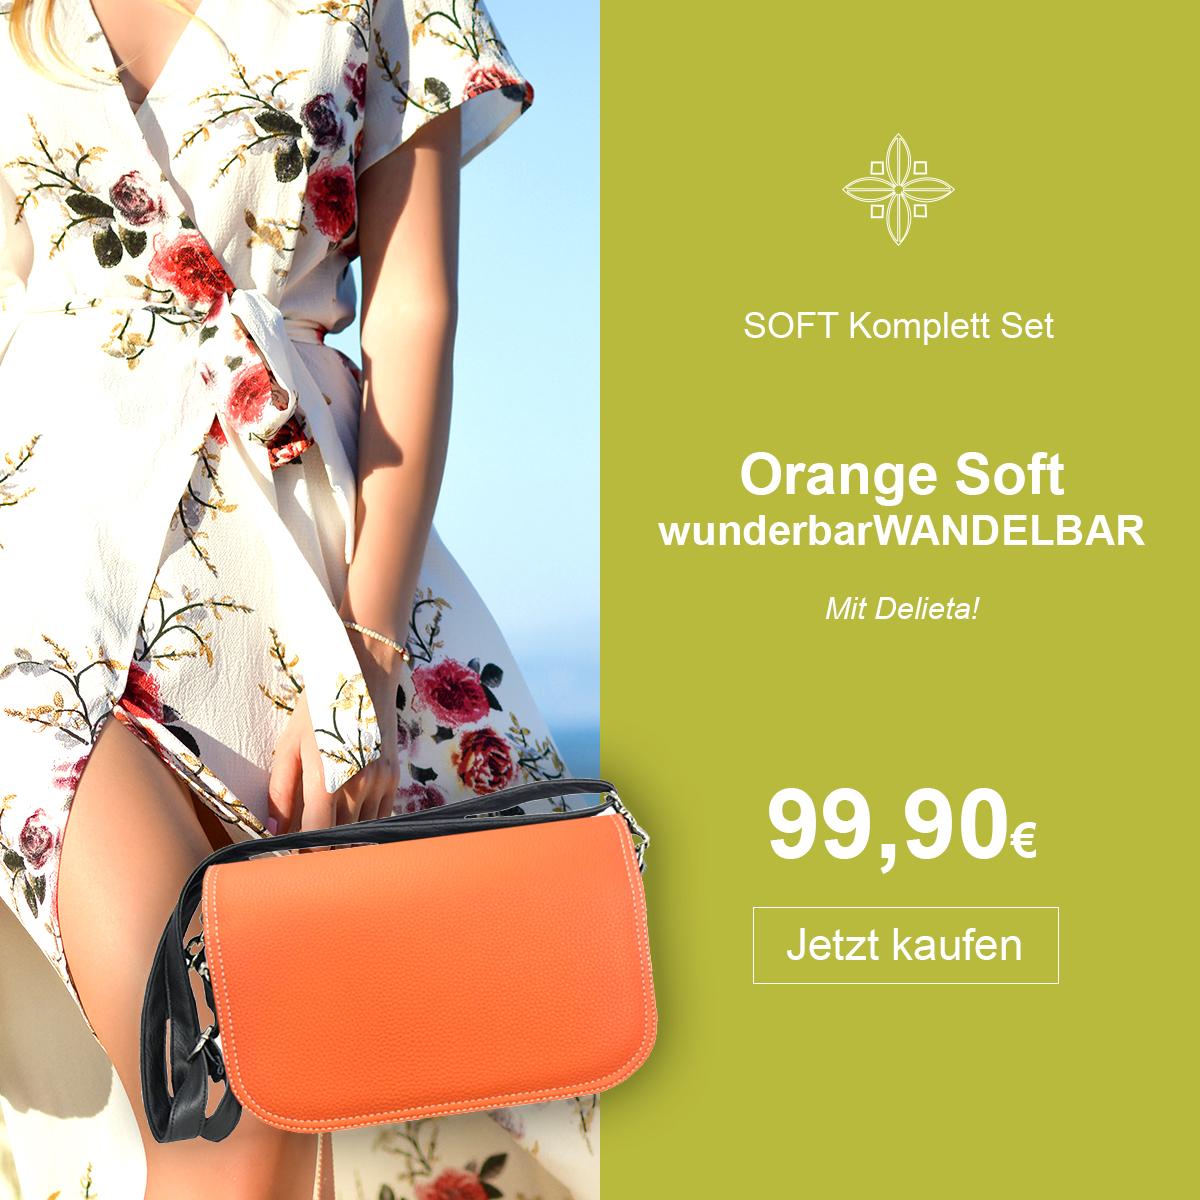 Orange Komplett Set